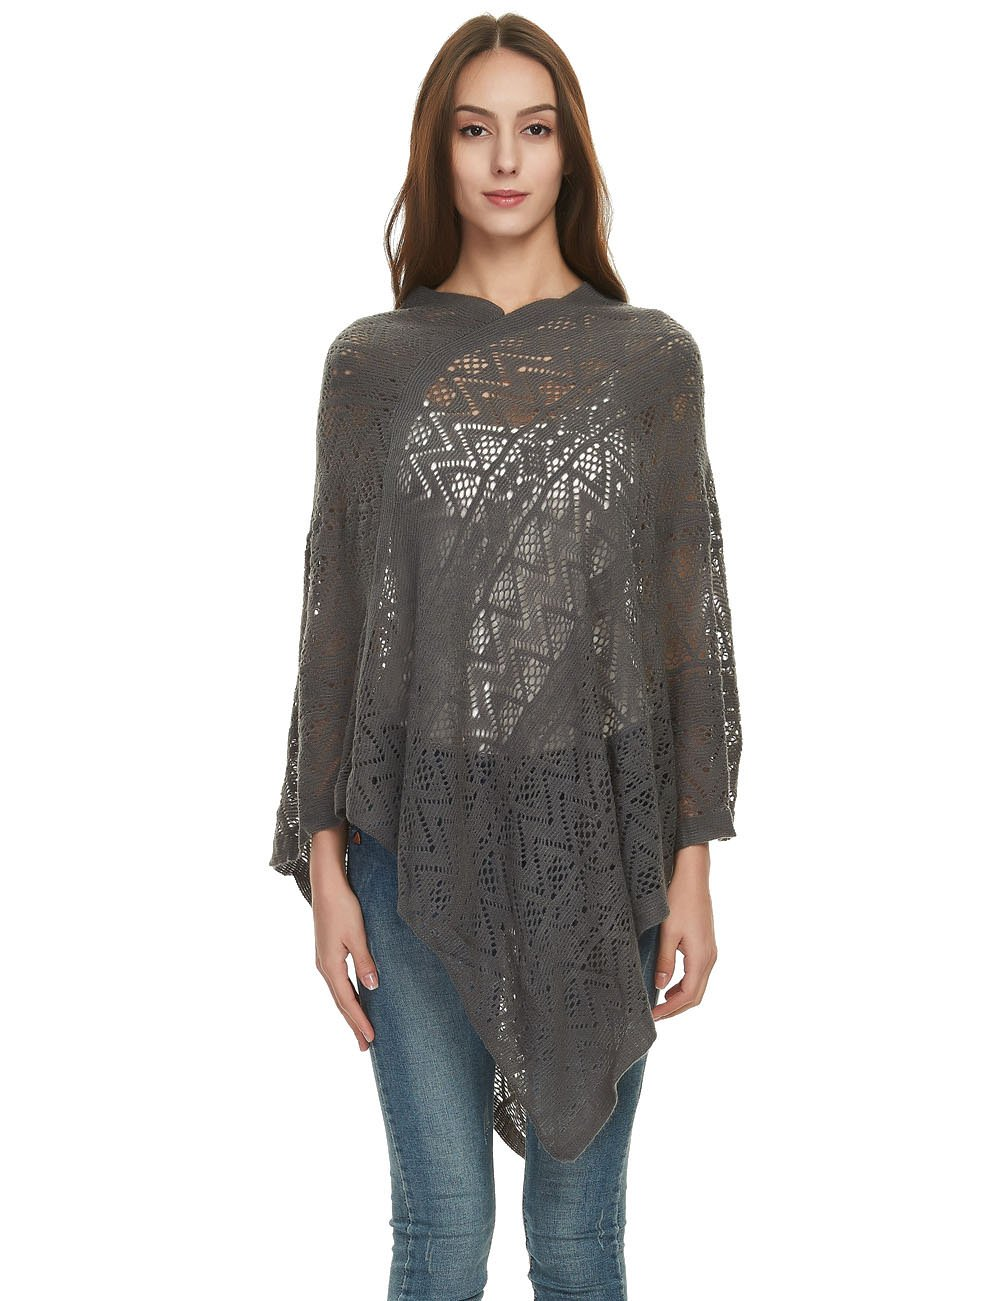 Ferand Crochet Thin Poncho Shawl Wrap with Asymmetric Hem Casual Tops for Women, One Size, Dark gray